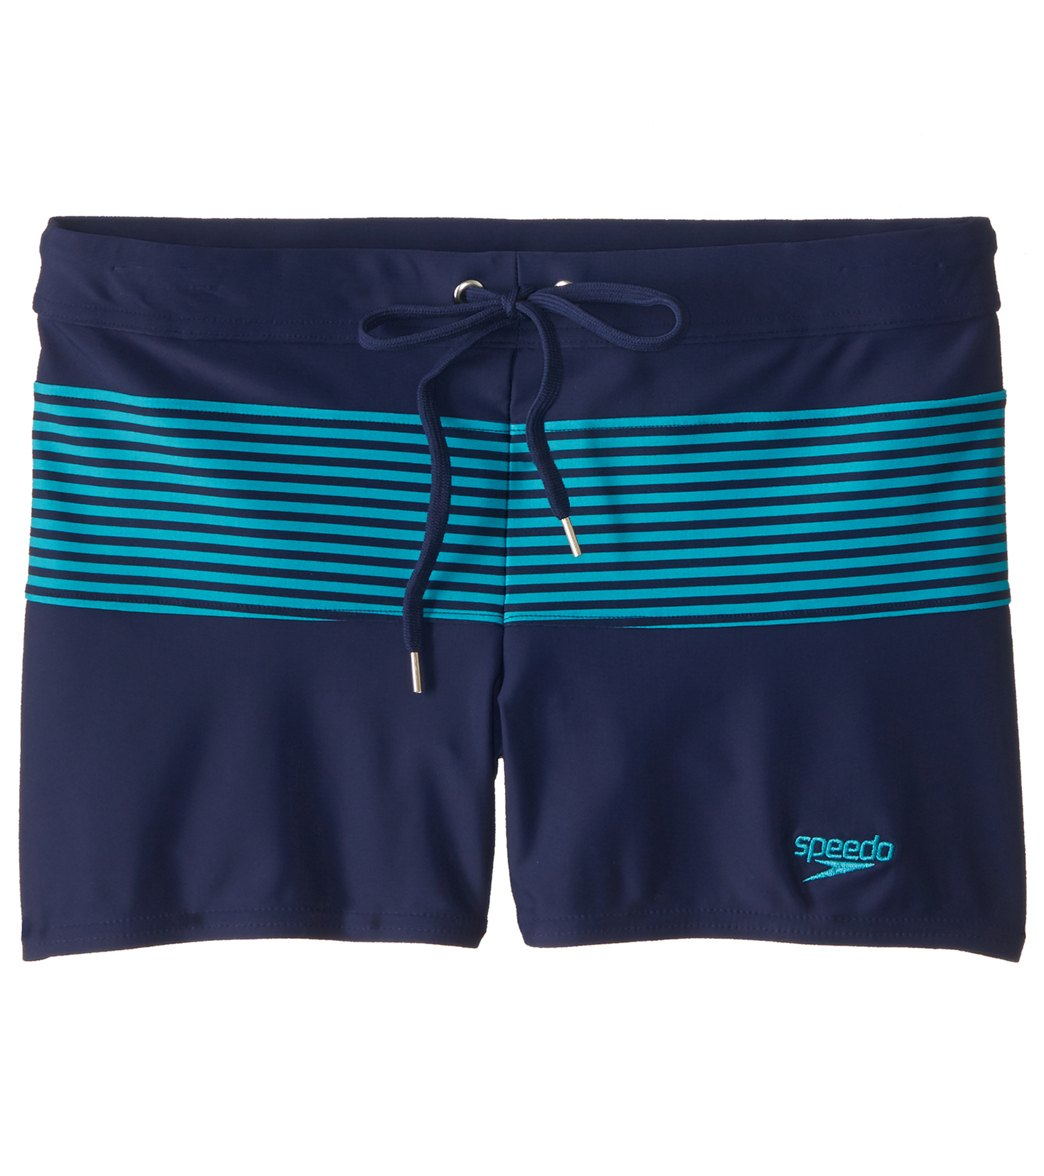 7e11be9b39 Speedo Men's Stripe Splice Square Leg Swimsuit at SwimOutlet.com